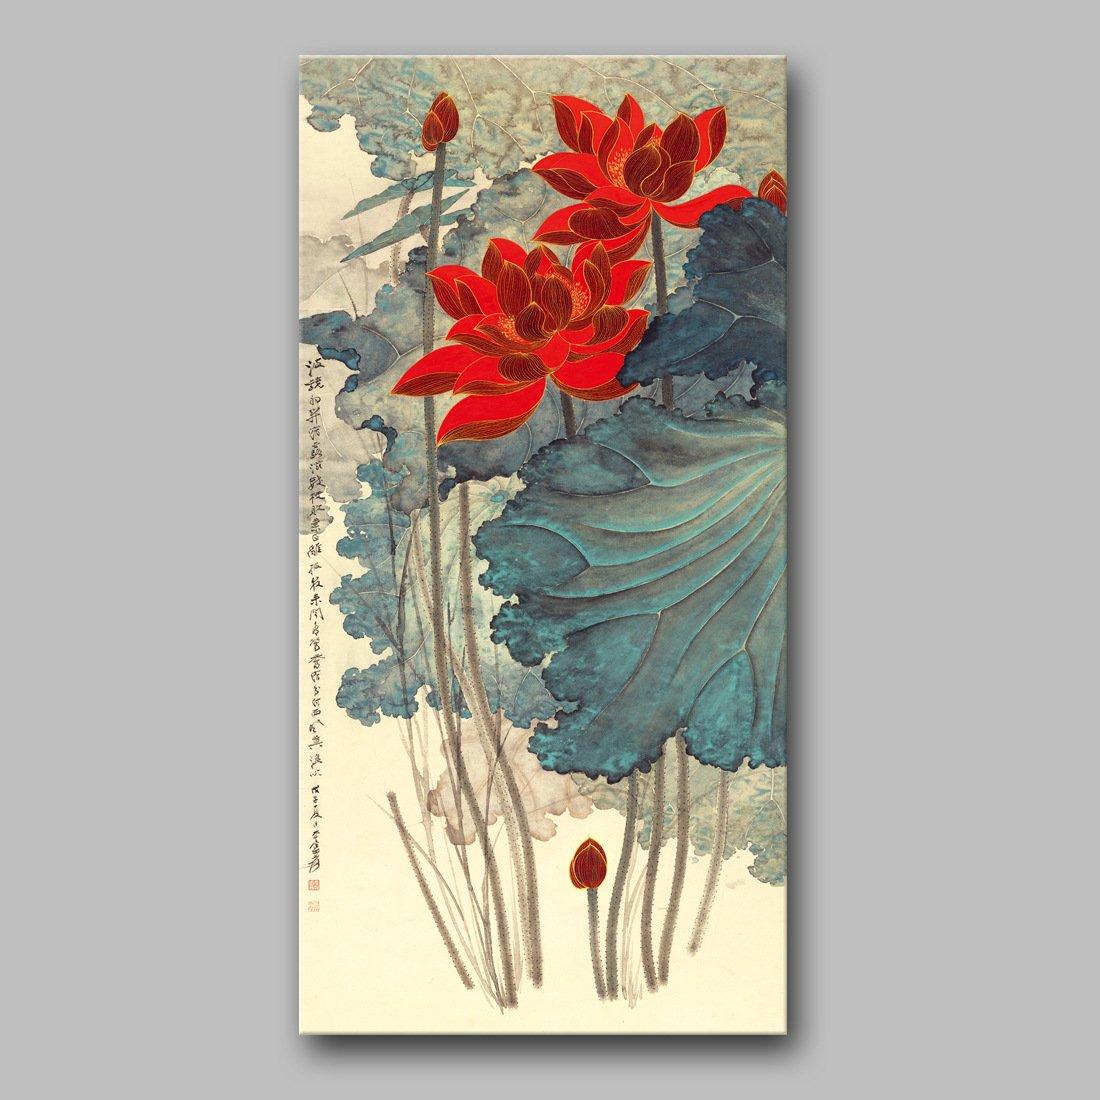 Sykdybz 現代的な中国絵画蓮の 3 つのオンライン店舗への書き込みや、当ホテルは、 40 X 80 Cm で装飾され、 B07D5WWR1K A A